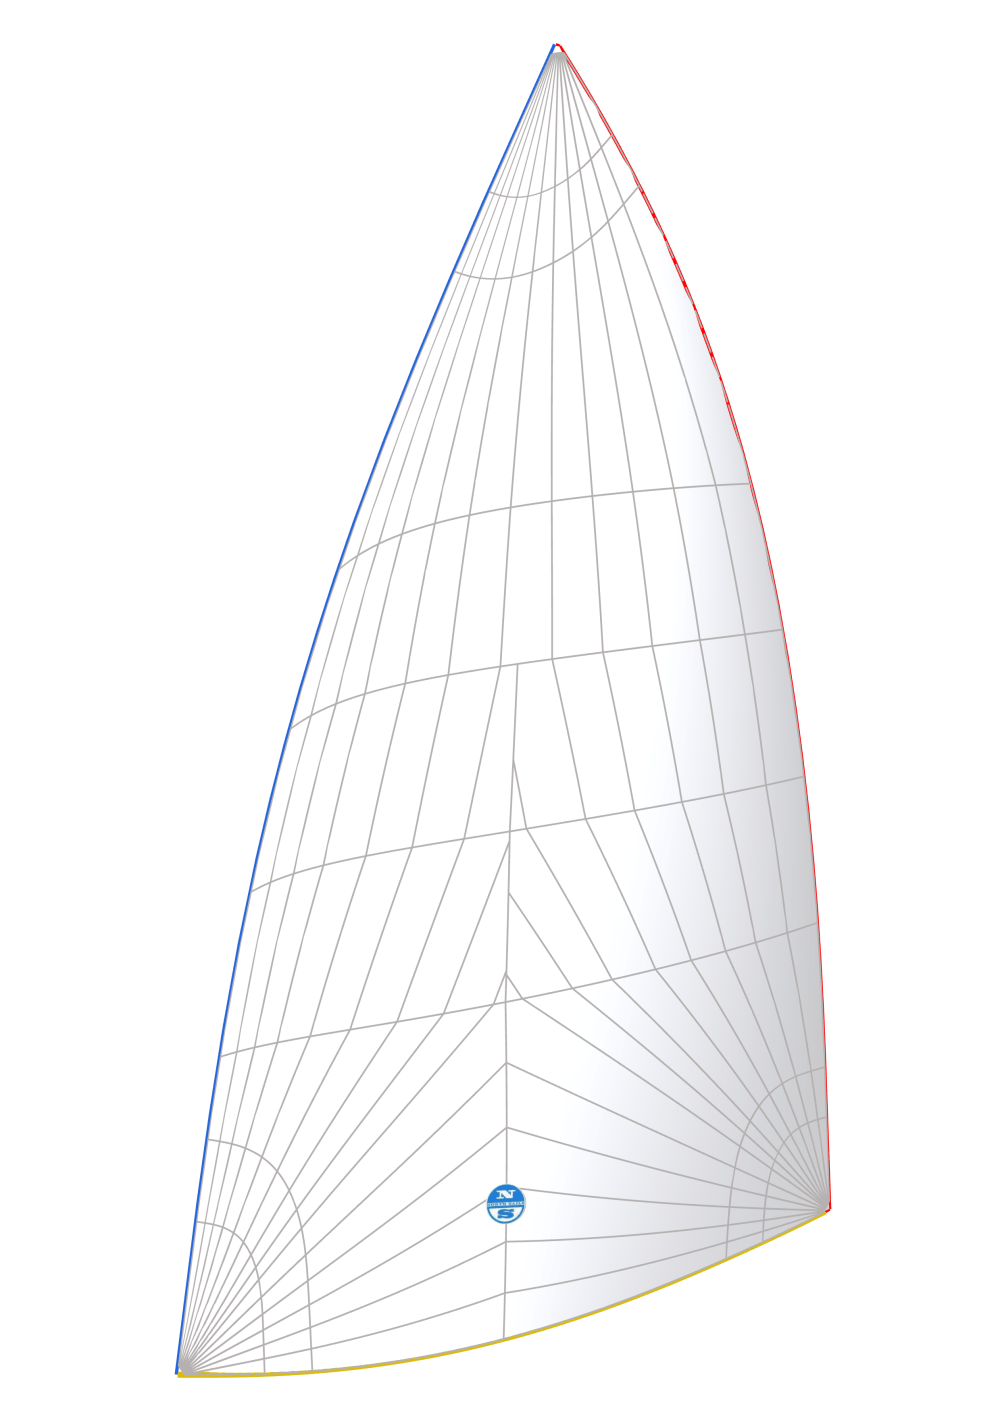 medium resolution of racing asymmetric spinnakers